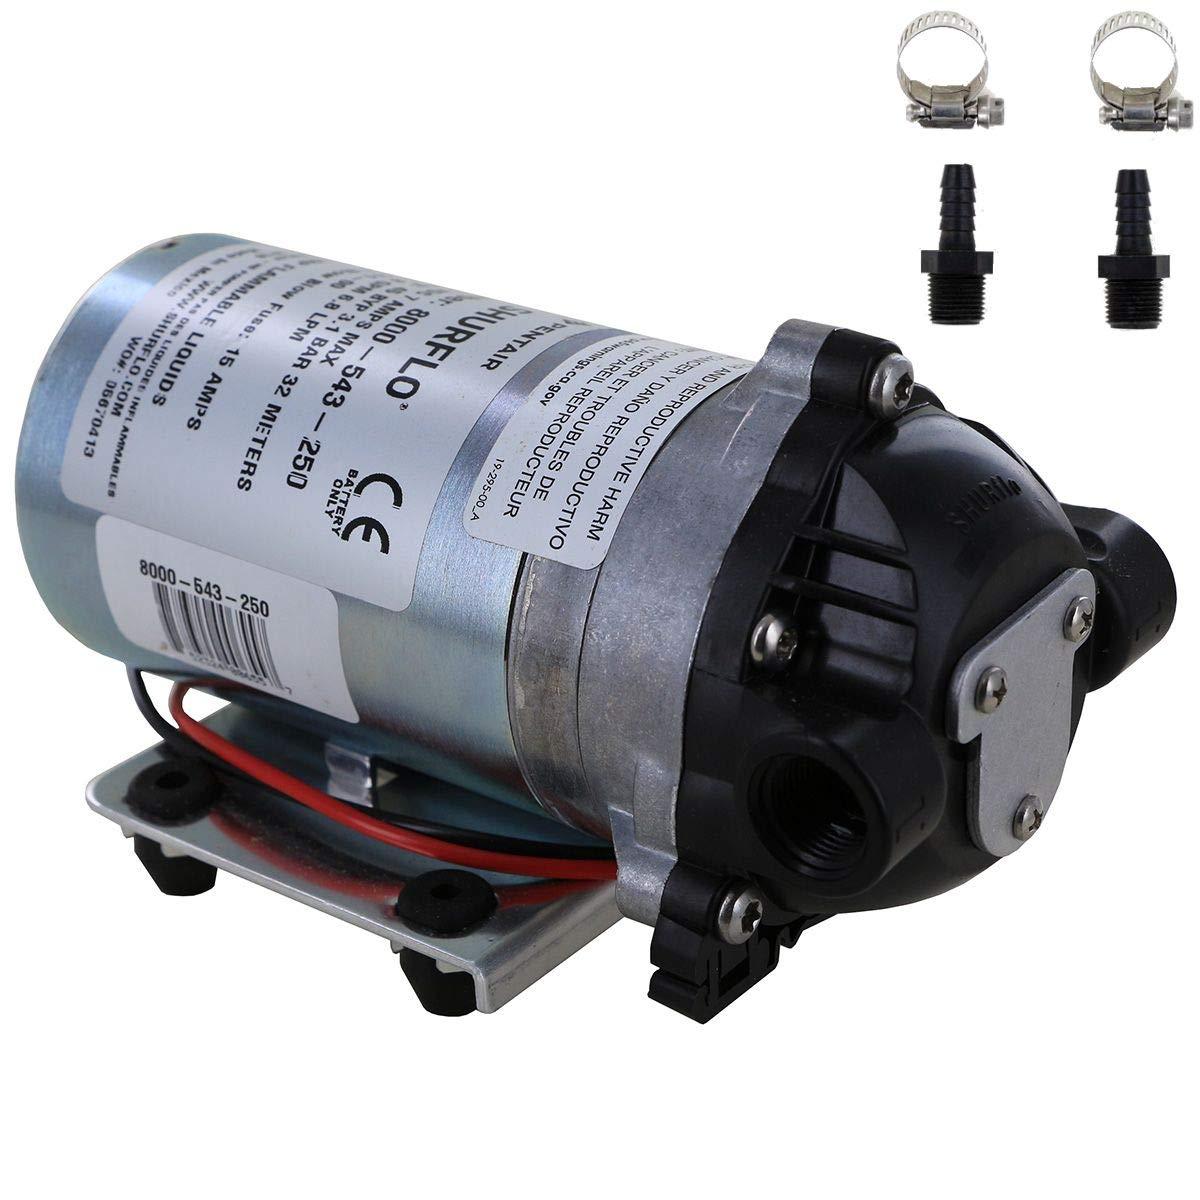 Shurflo 8000-543-250 Bypass 12V Diaphragm Pump with Male 3/8'' Hose Barb Kit (Bundle, 2 Items)